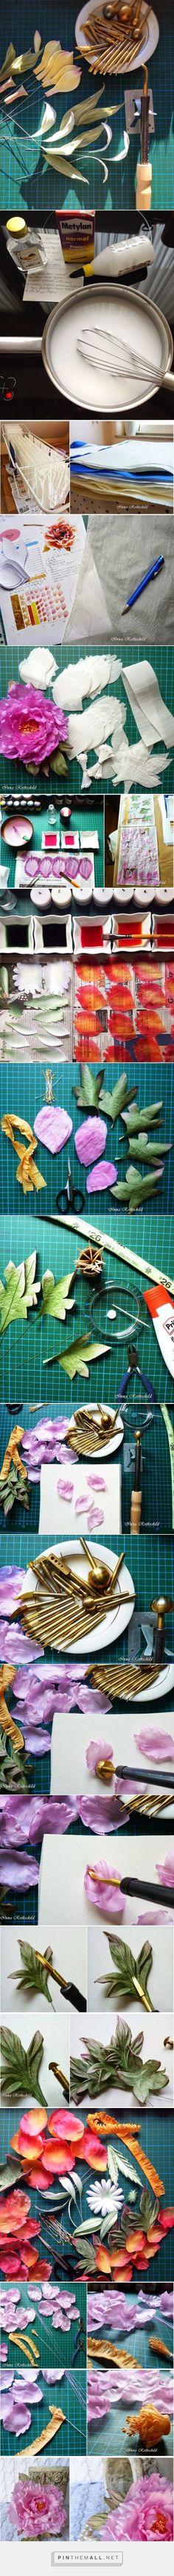 Шелковые фантазии и...: Как сделать цветок из шелка? http://silkflower-accessories-and-deko.blogspot.ru/2014/07/How-to-make-a-silk-flower.html: